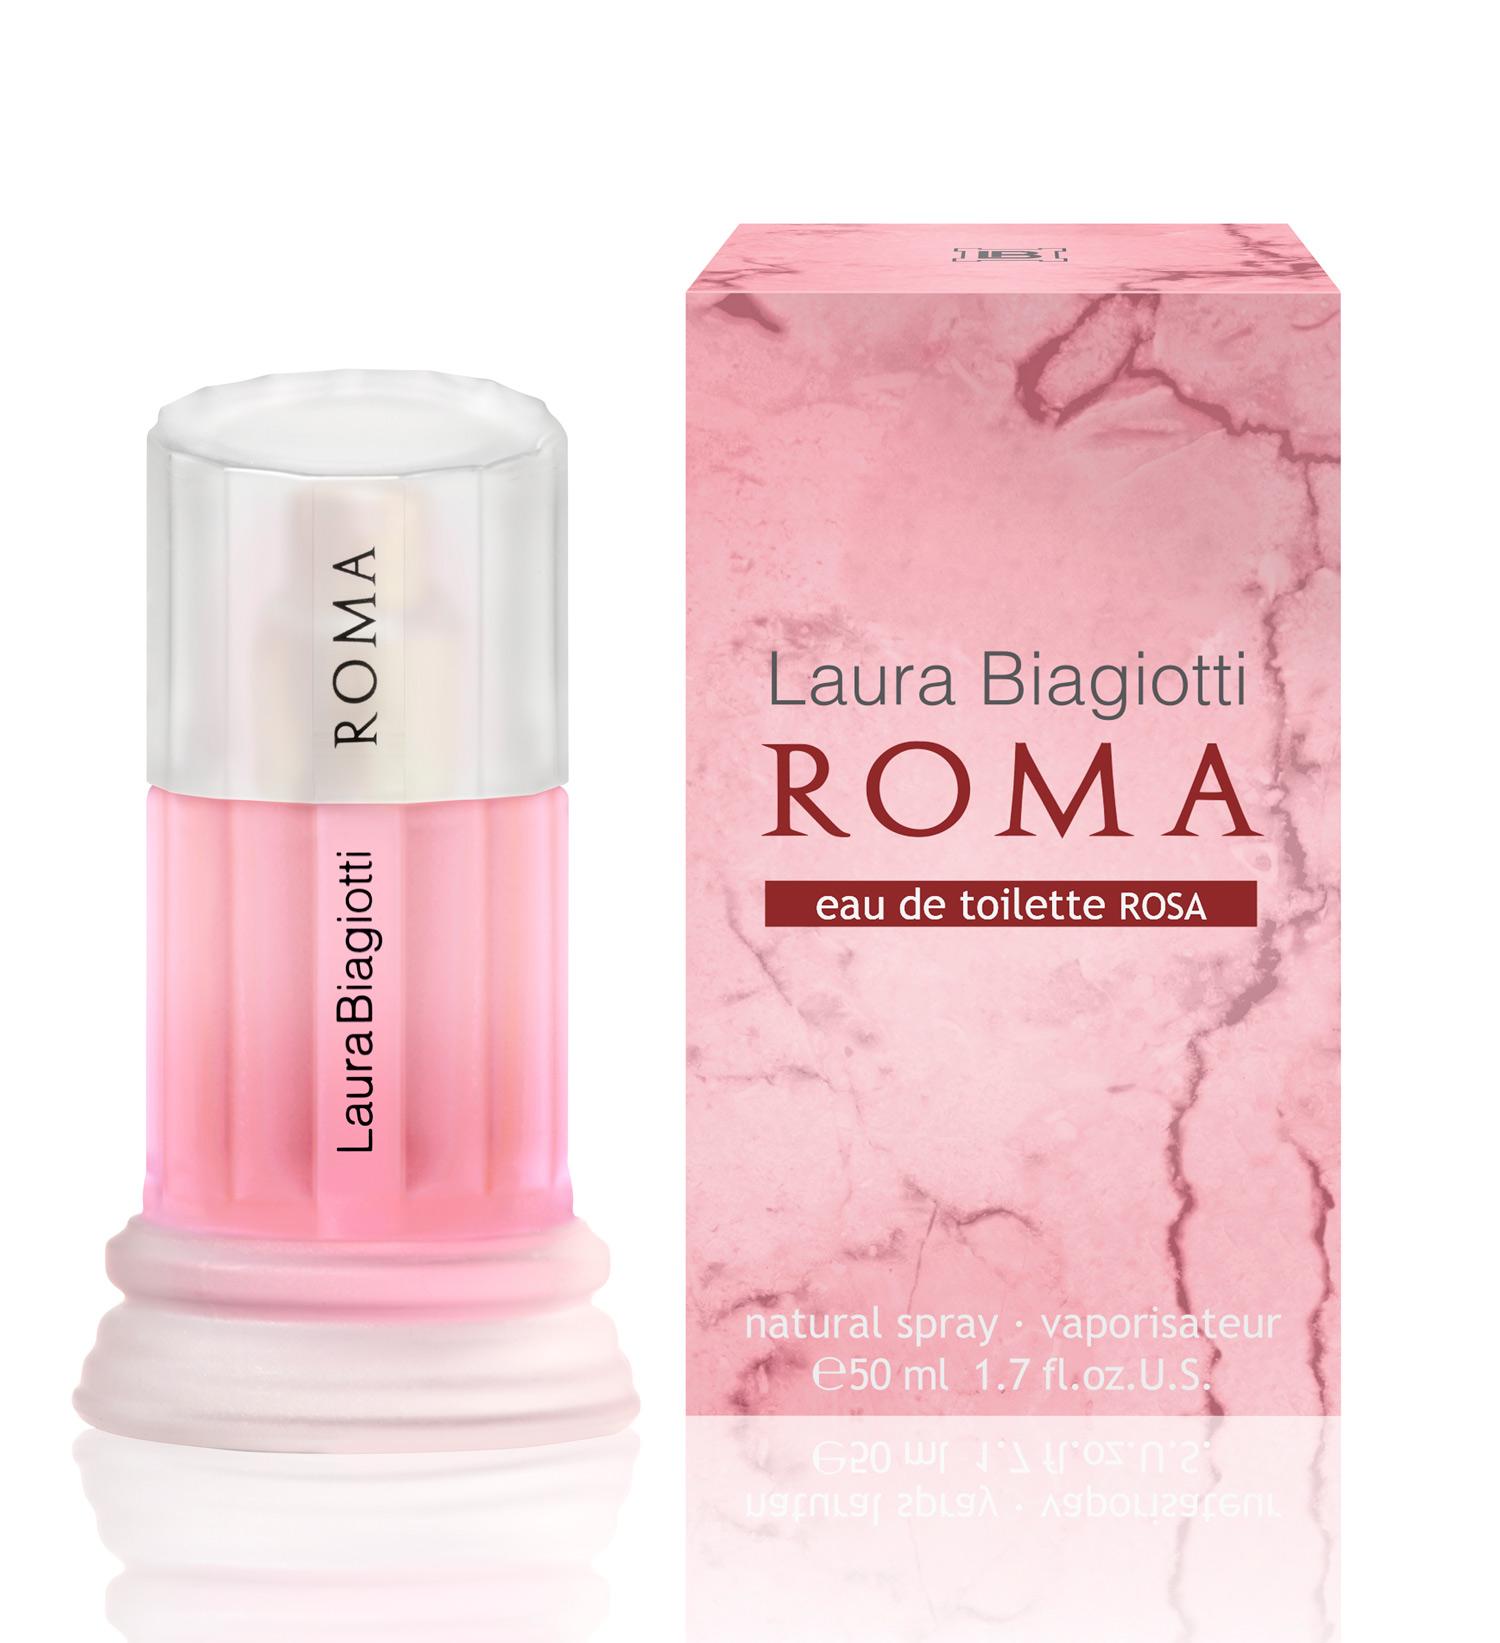 a5ff3ddb907d Roma Eau de Toilette Rosa Laura Biagiotti perfume - a new fragrance ...